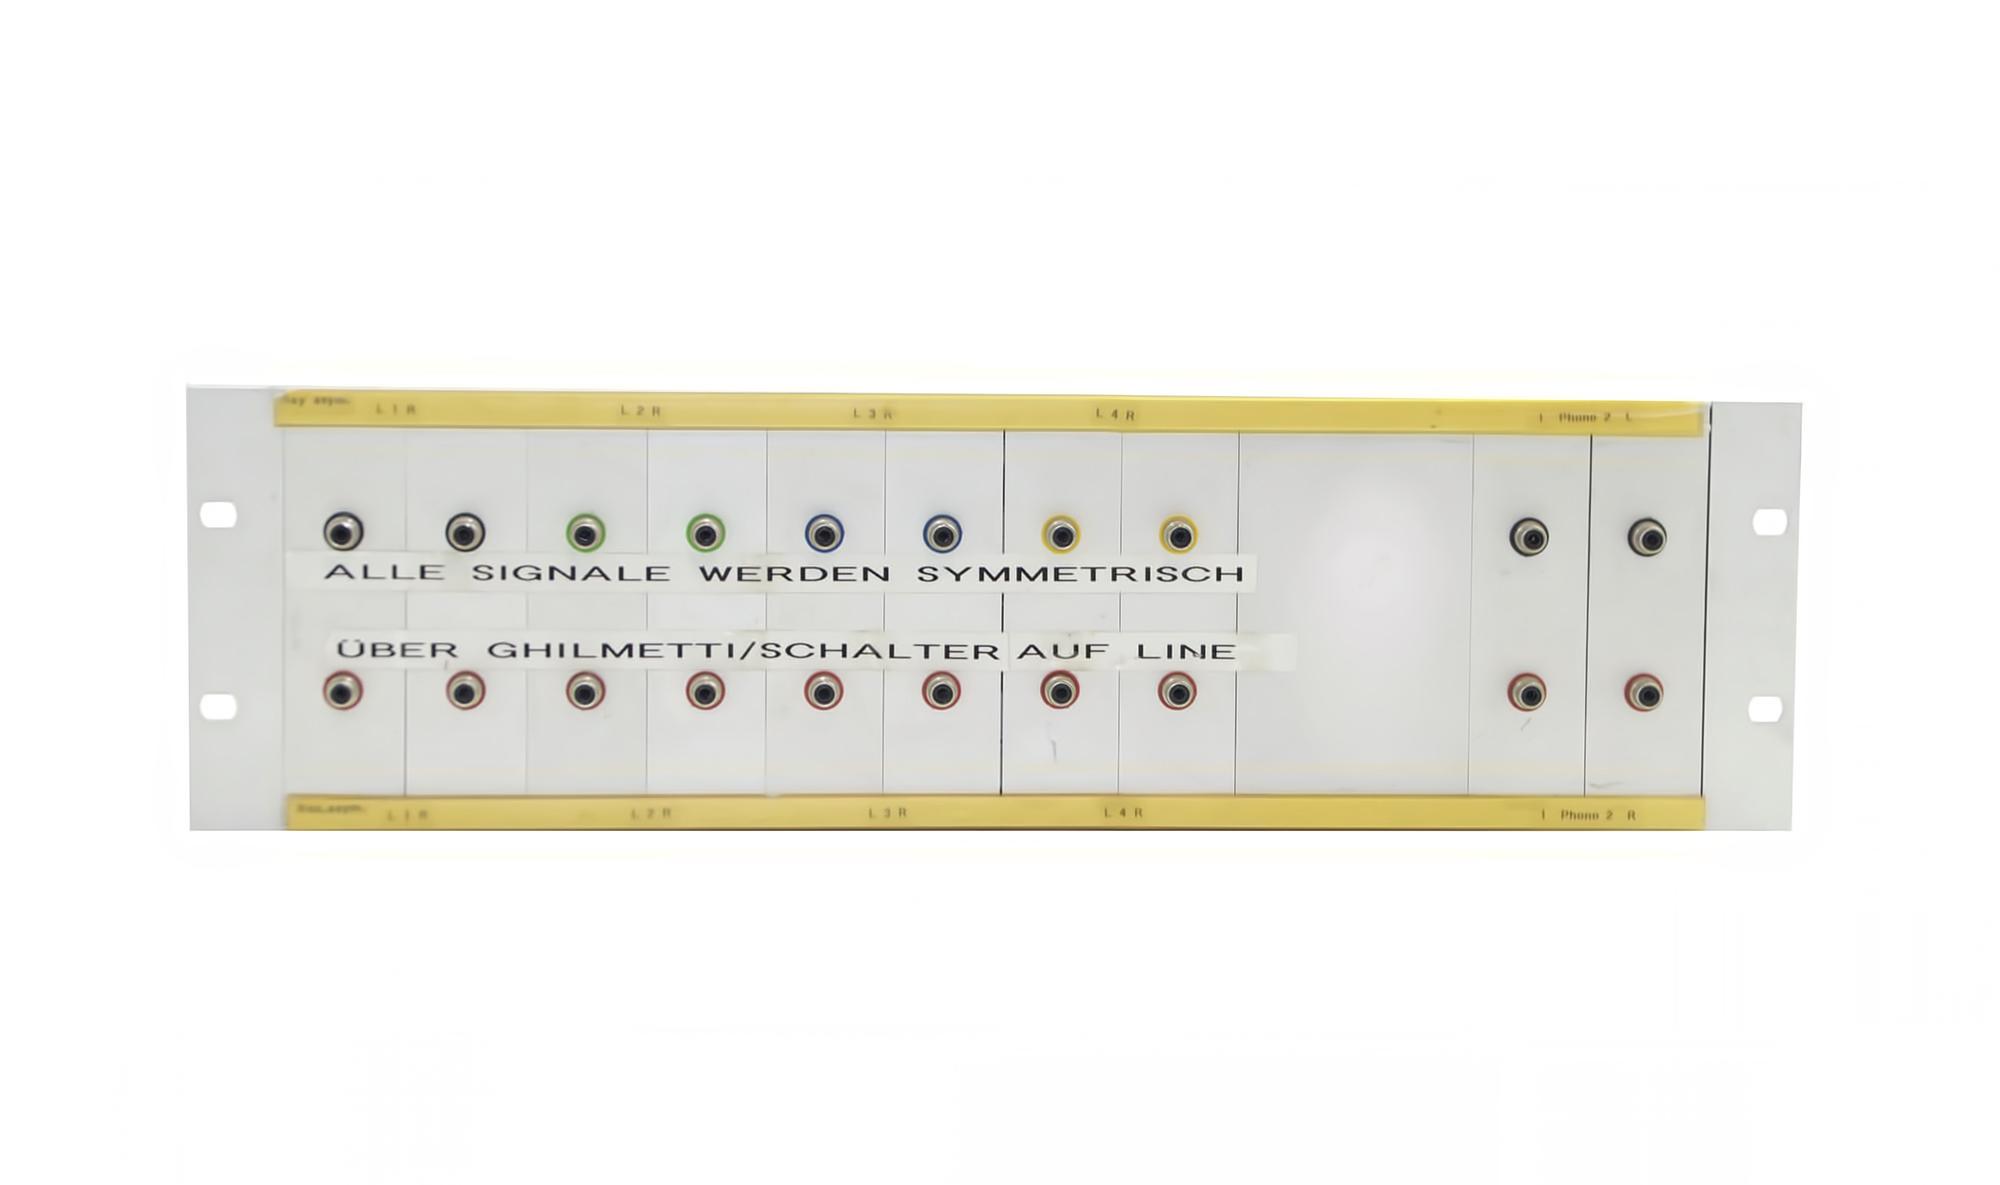 Rca Patch Bay On Board Studio B Tascam Pb 32r W Sk1 Getlofi Circuit Bending Synth Diy Vintagetools Shop 19 Inch 3ru Patchbay 20x Unbalanced To One